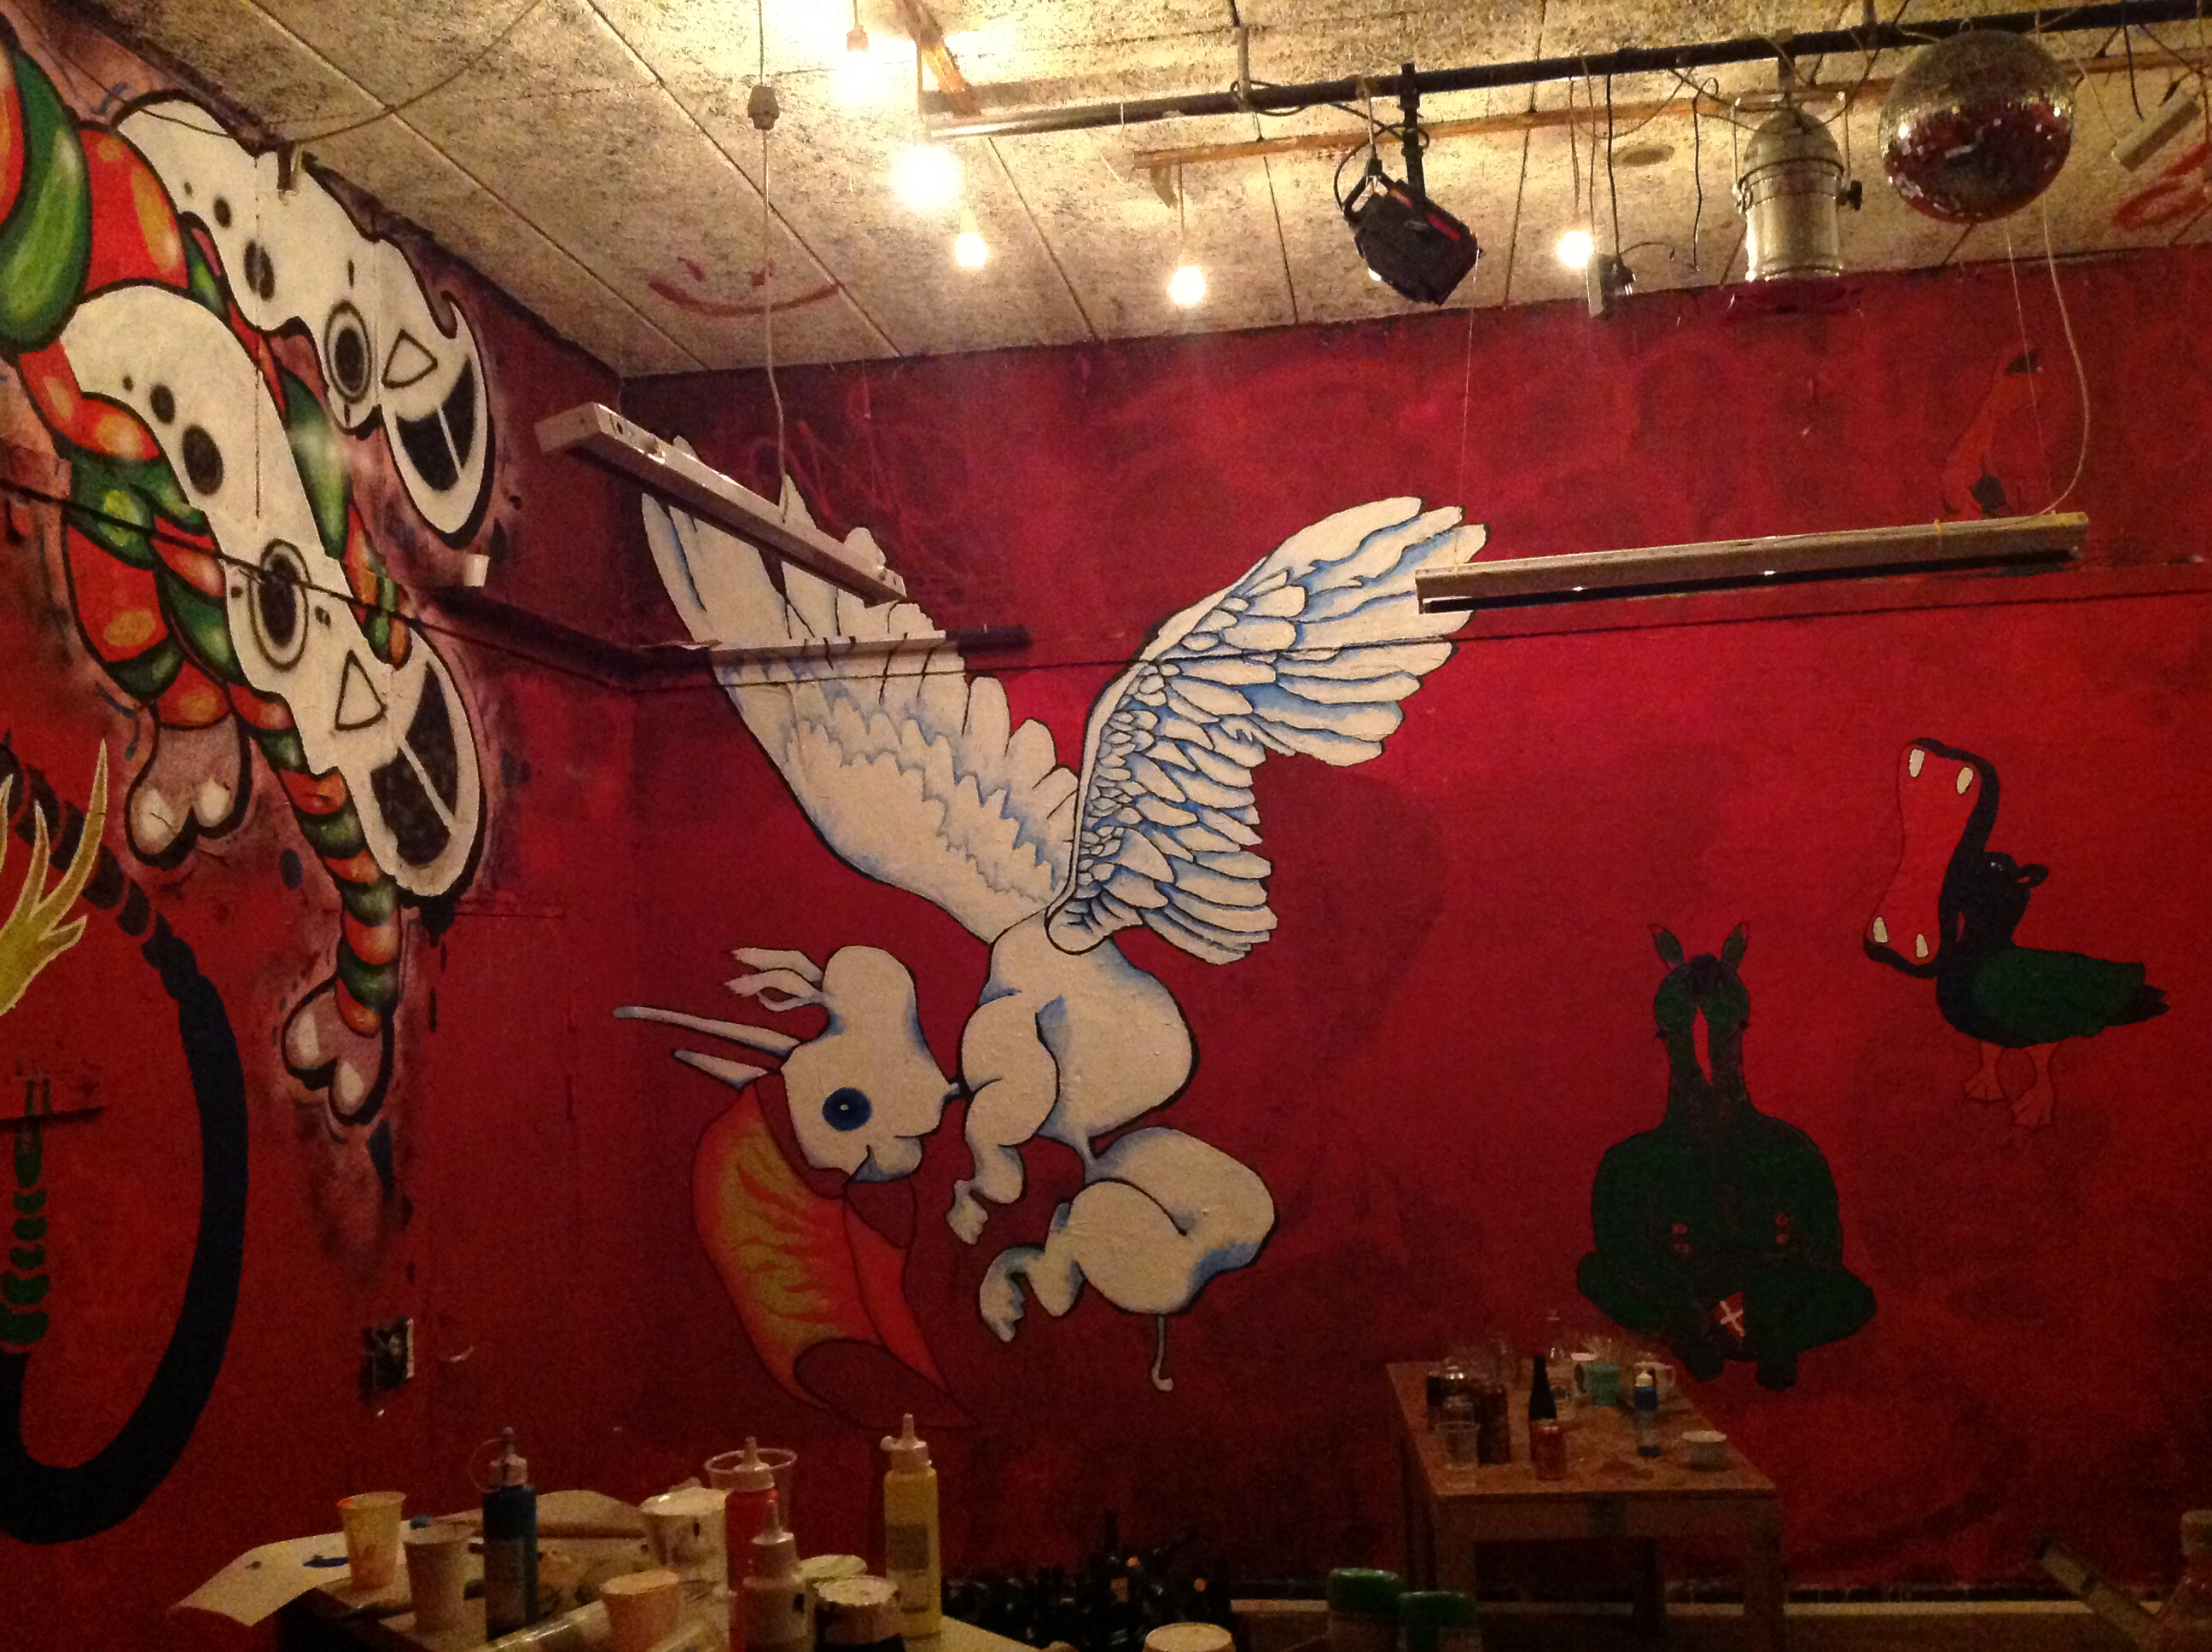 Maleri projekt i Kunsthøjskolen cafe